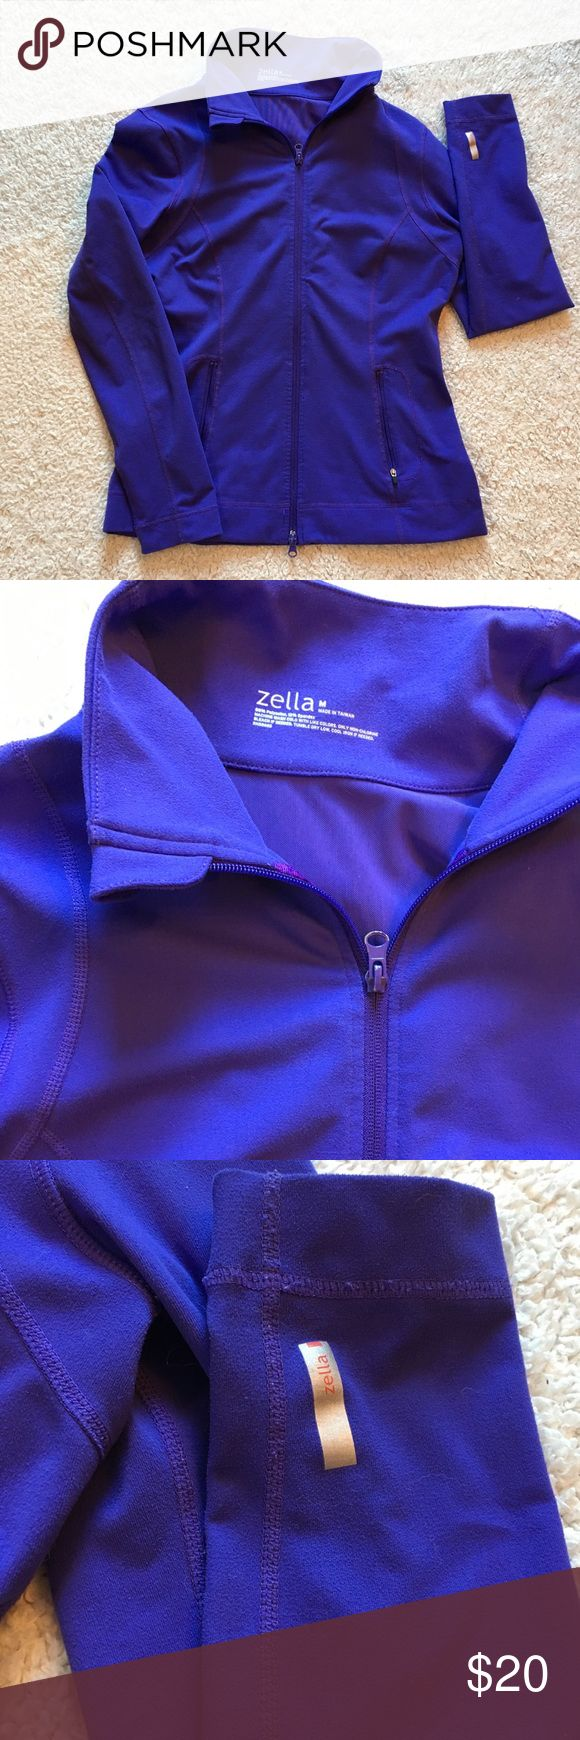 Zella Purple Zip-Up Jacket Size Medium Lightly worn, Zella purple zip up jacket. It looks kind of blue in the photos but it is purple.  Worn only a few times. Zella Jackets & Coats